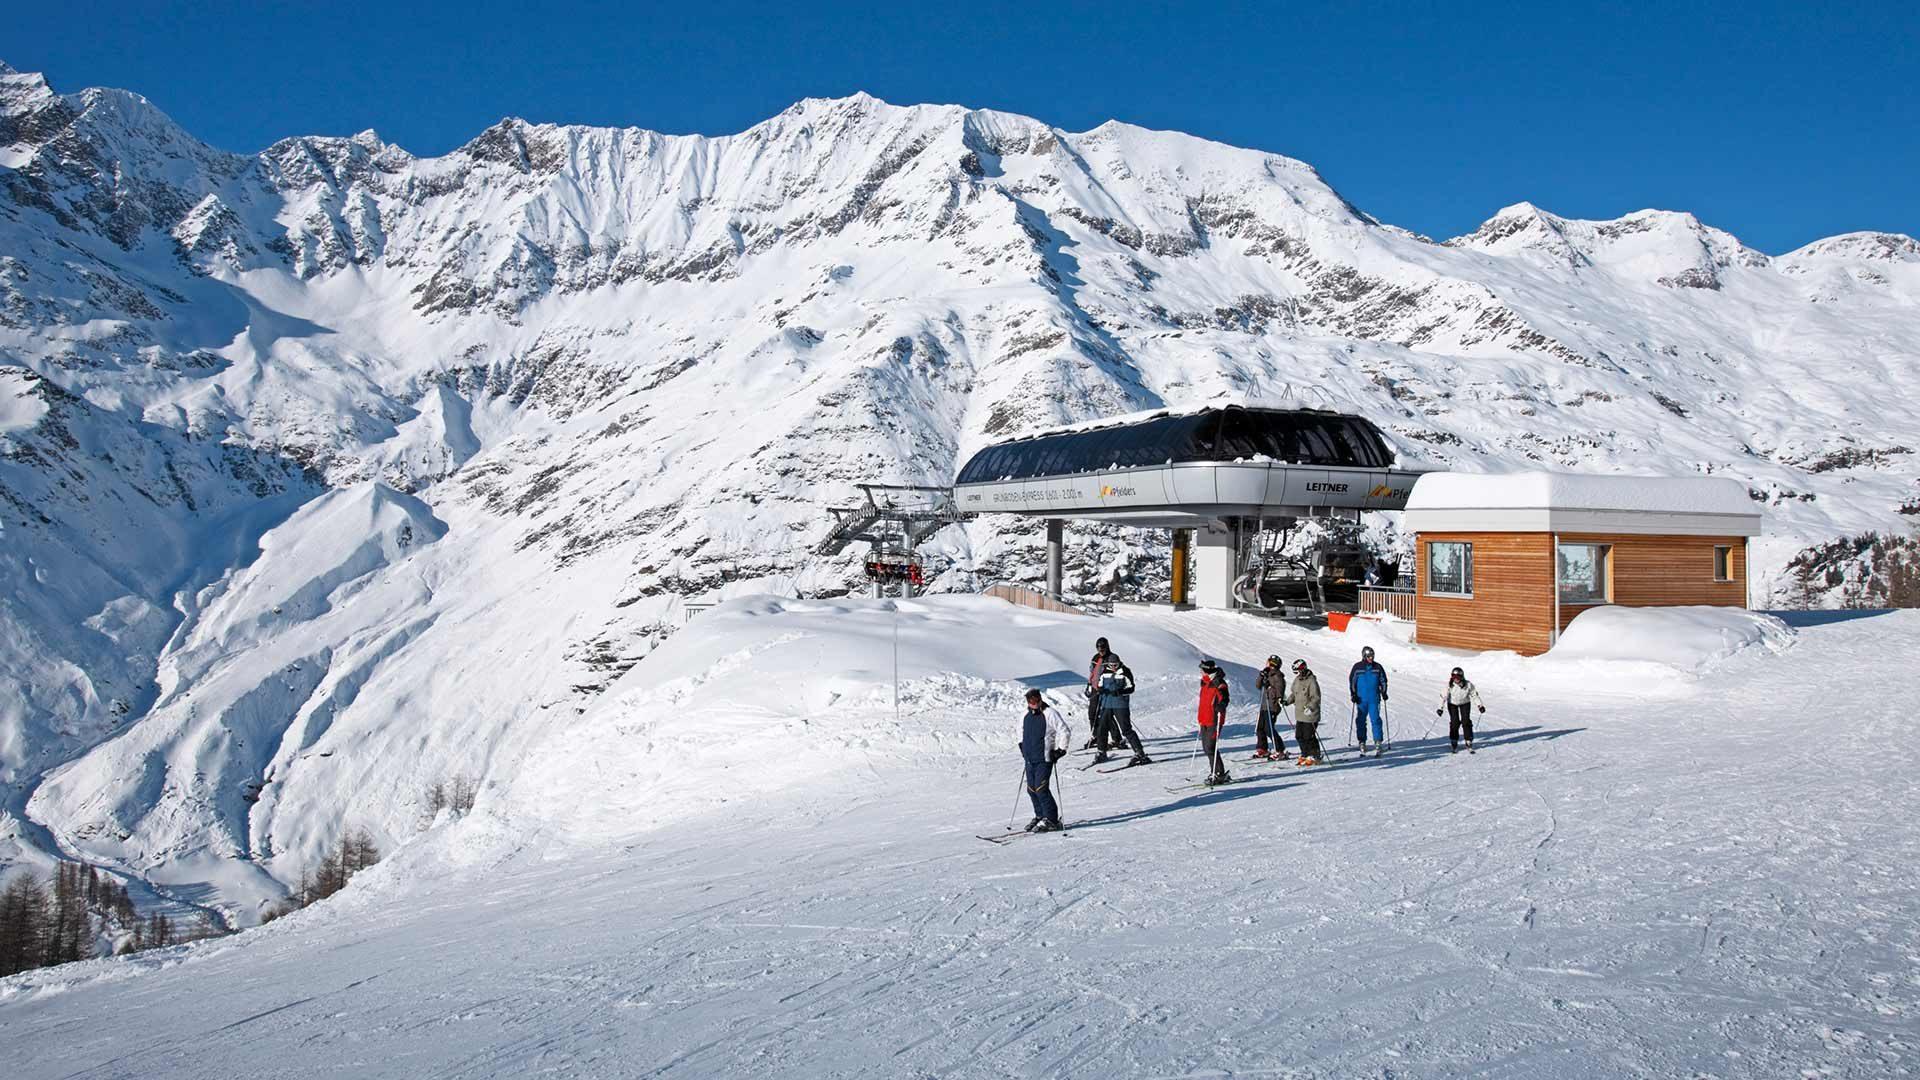 Skigebiet Pfelders - Skifahren